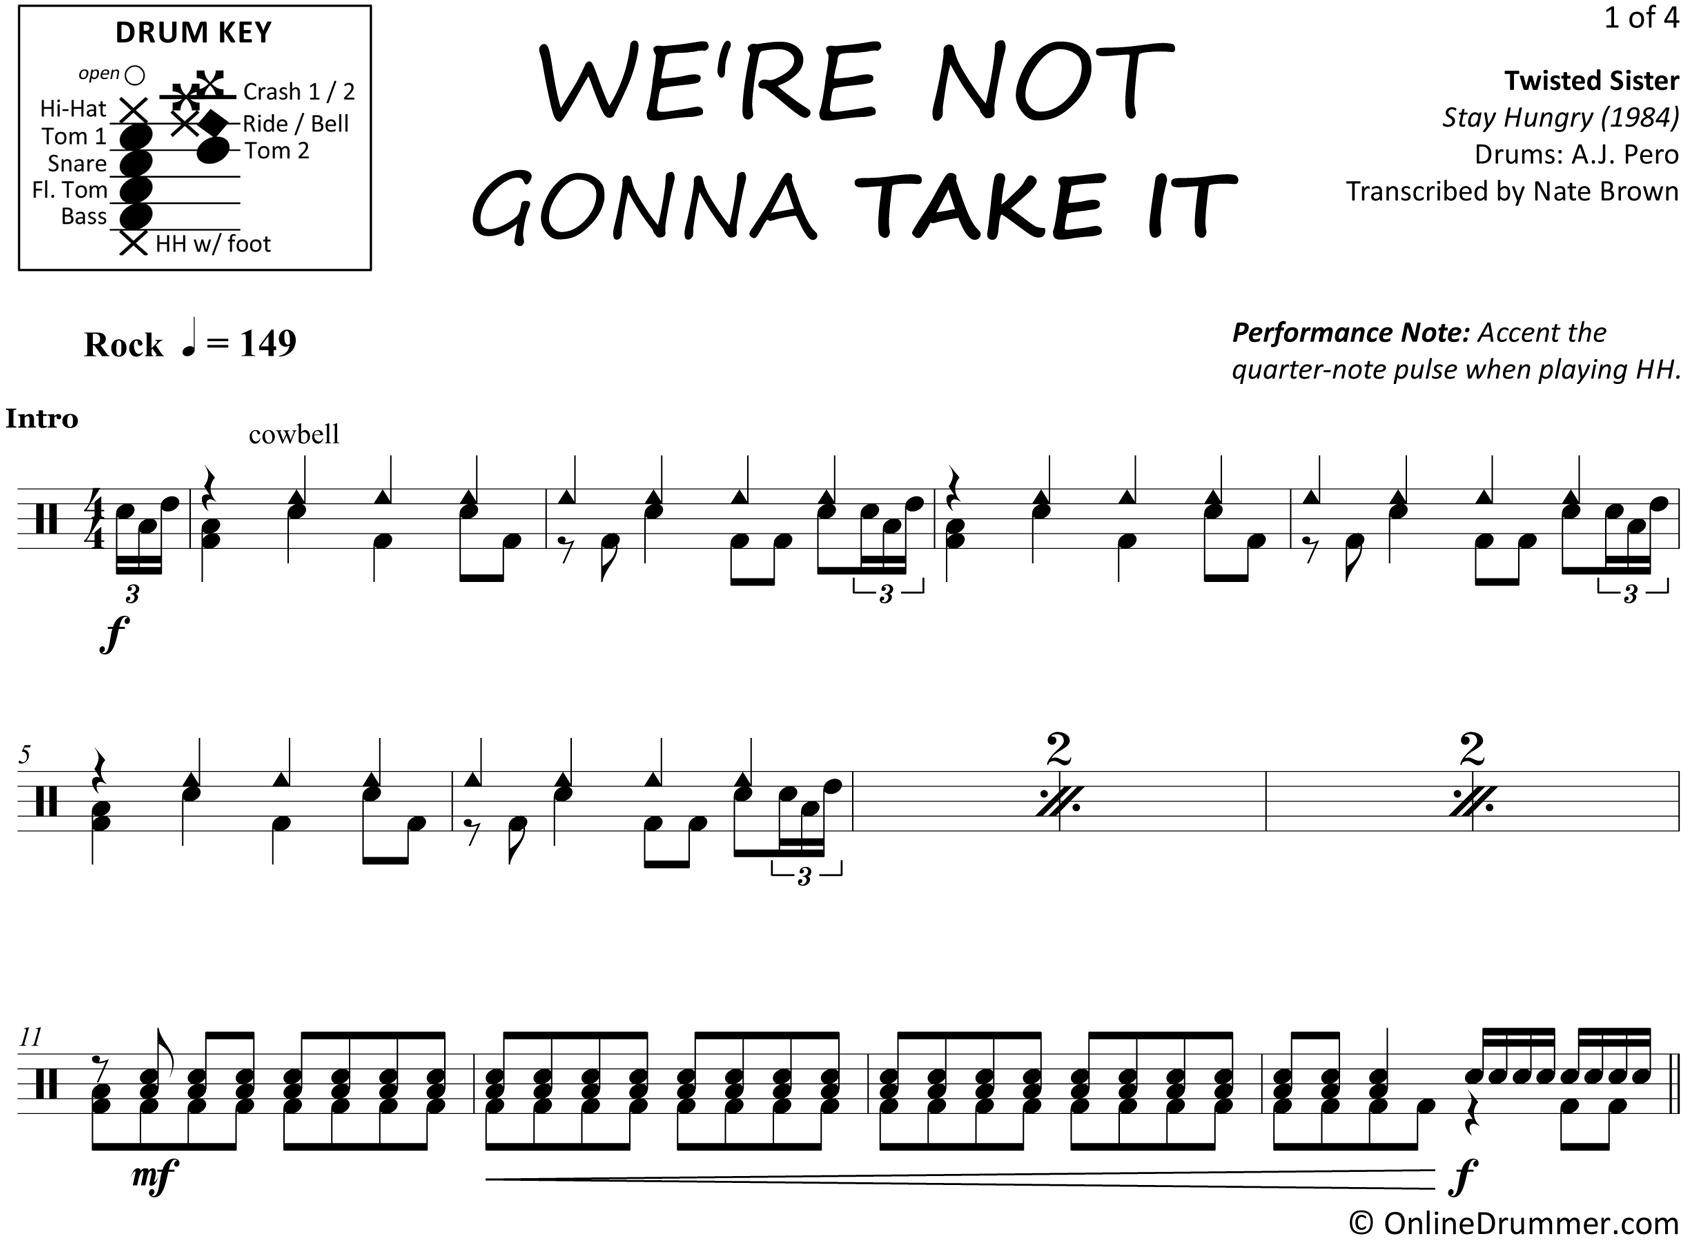 we're not gonna take it - twisted sister - drum sheet music |  onlinedrummer.com | drum sheet music, drums sheet, sheet music  pinterest